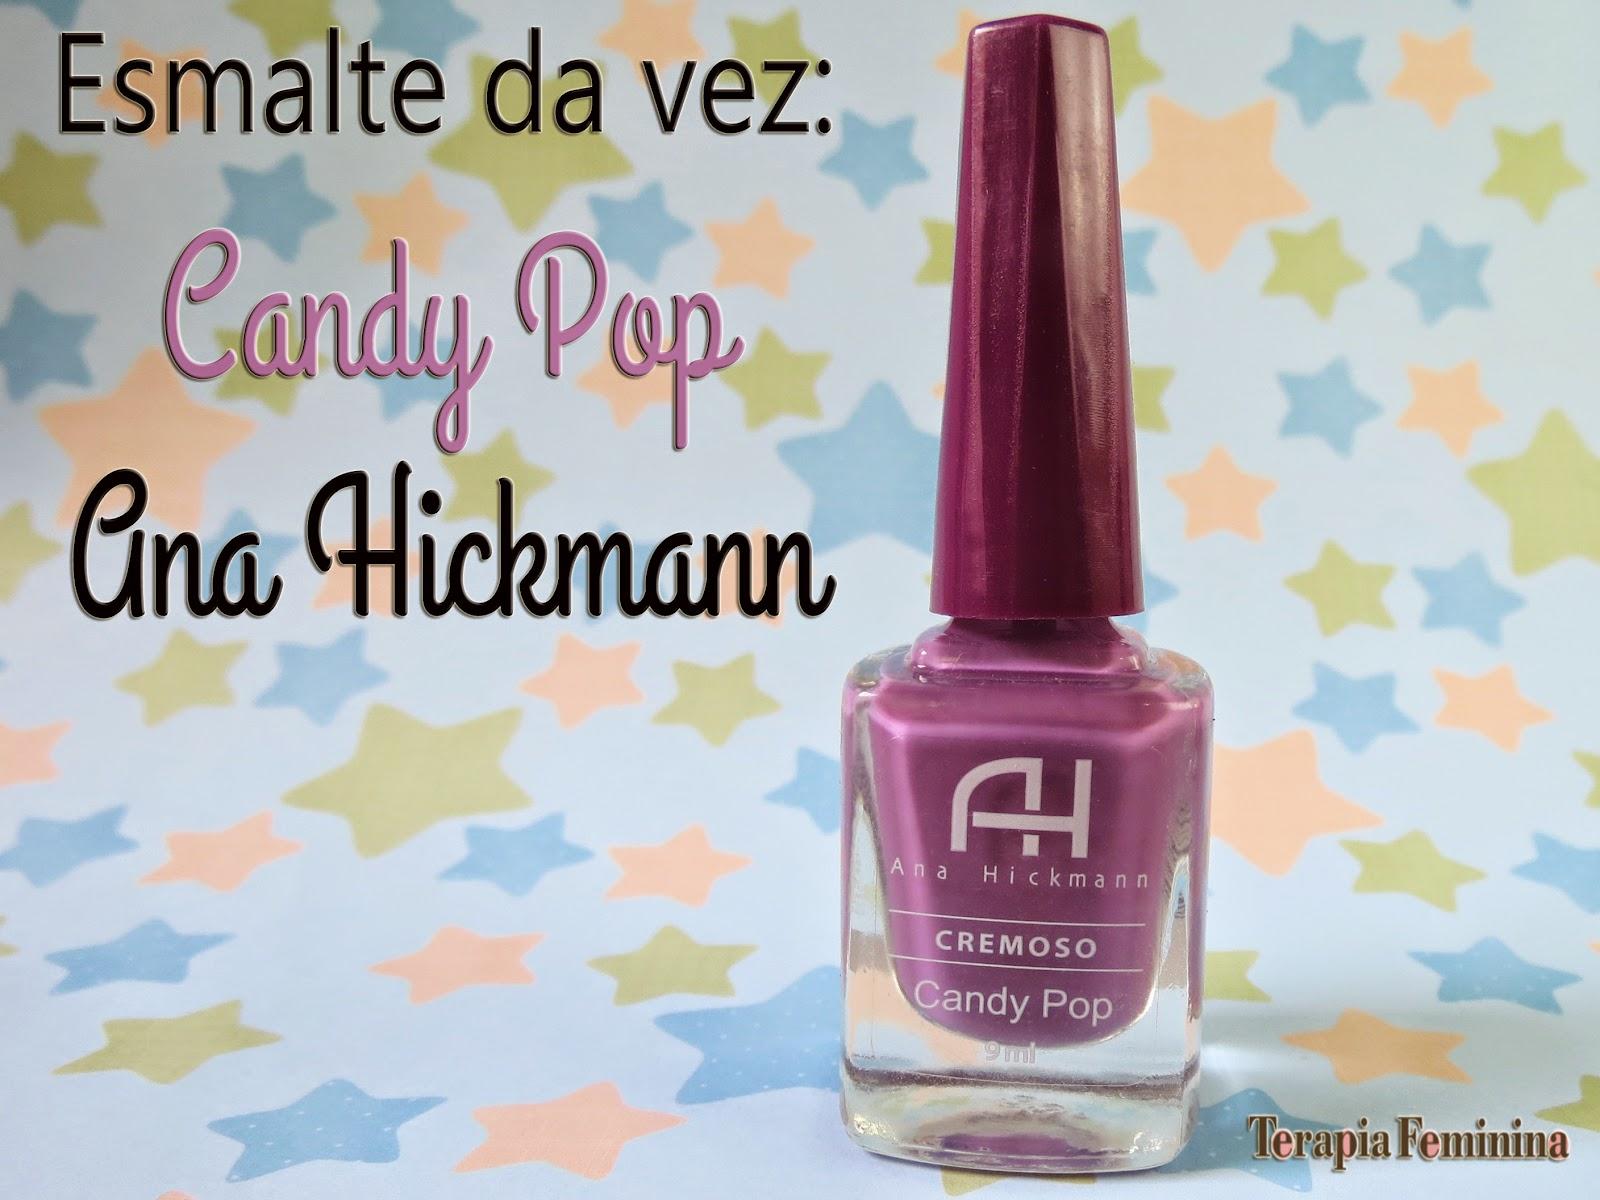 Esmaltes Ana Hickmann Pop Esmaltes da Ana Hickmann